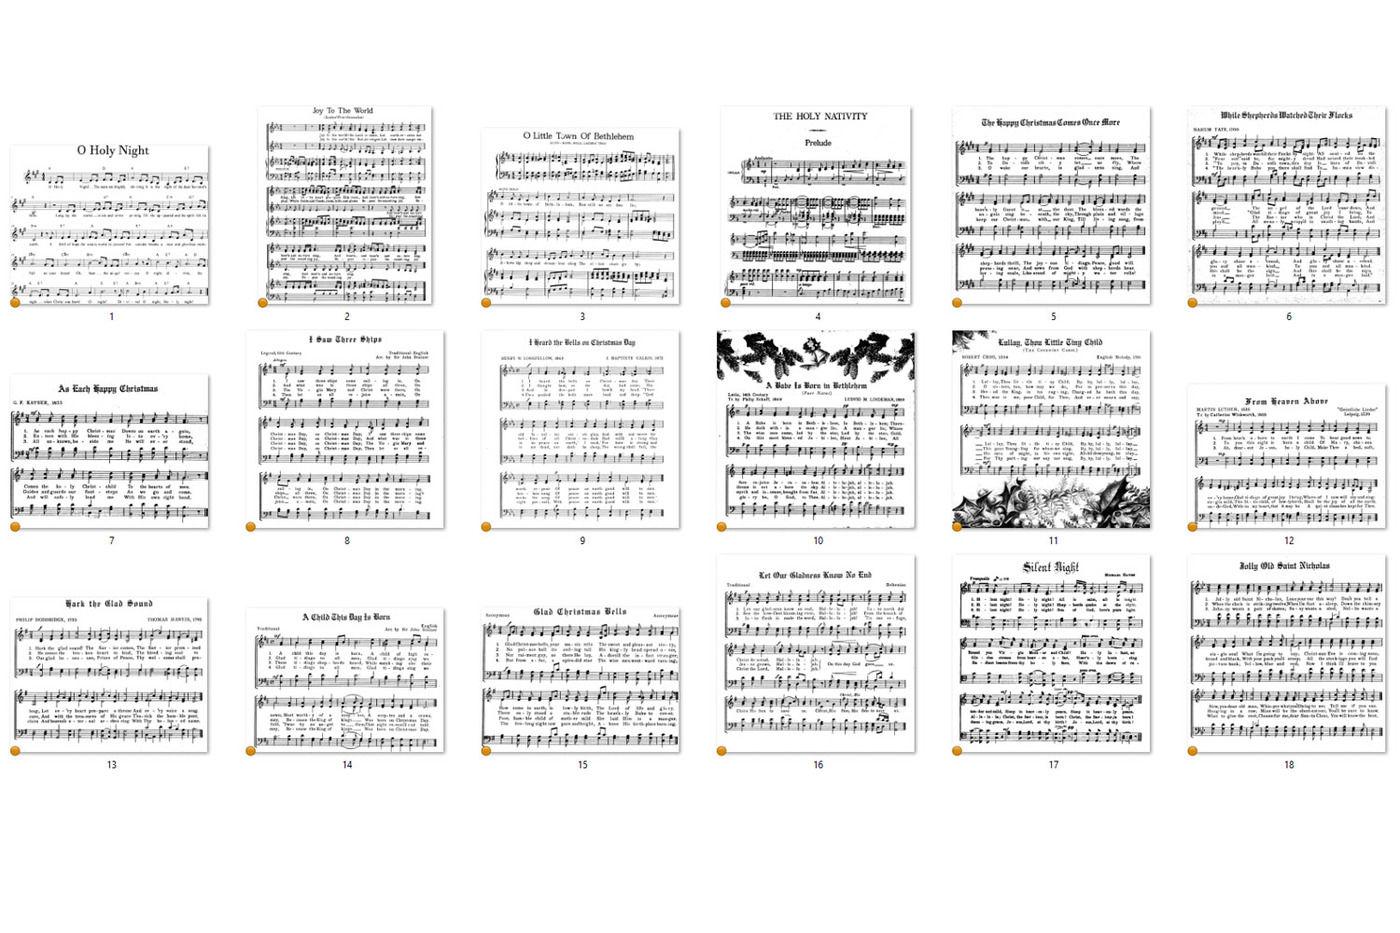 Christmas Music Overlays By Digital Curio Thehungryjpeg Com